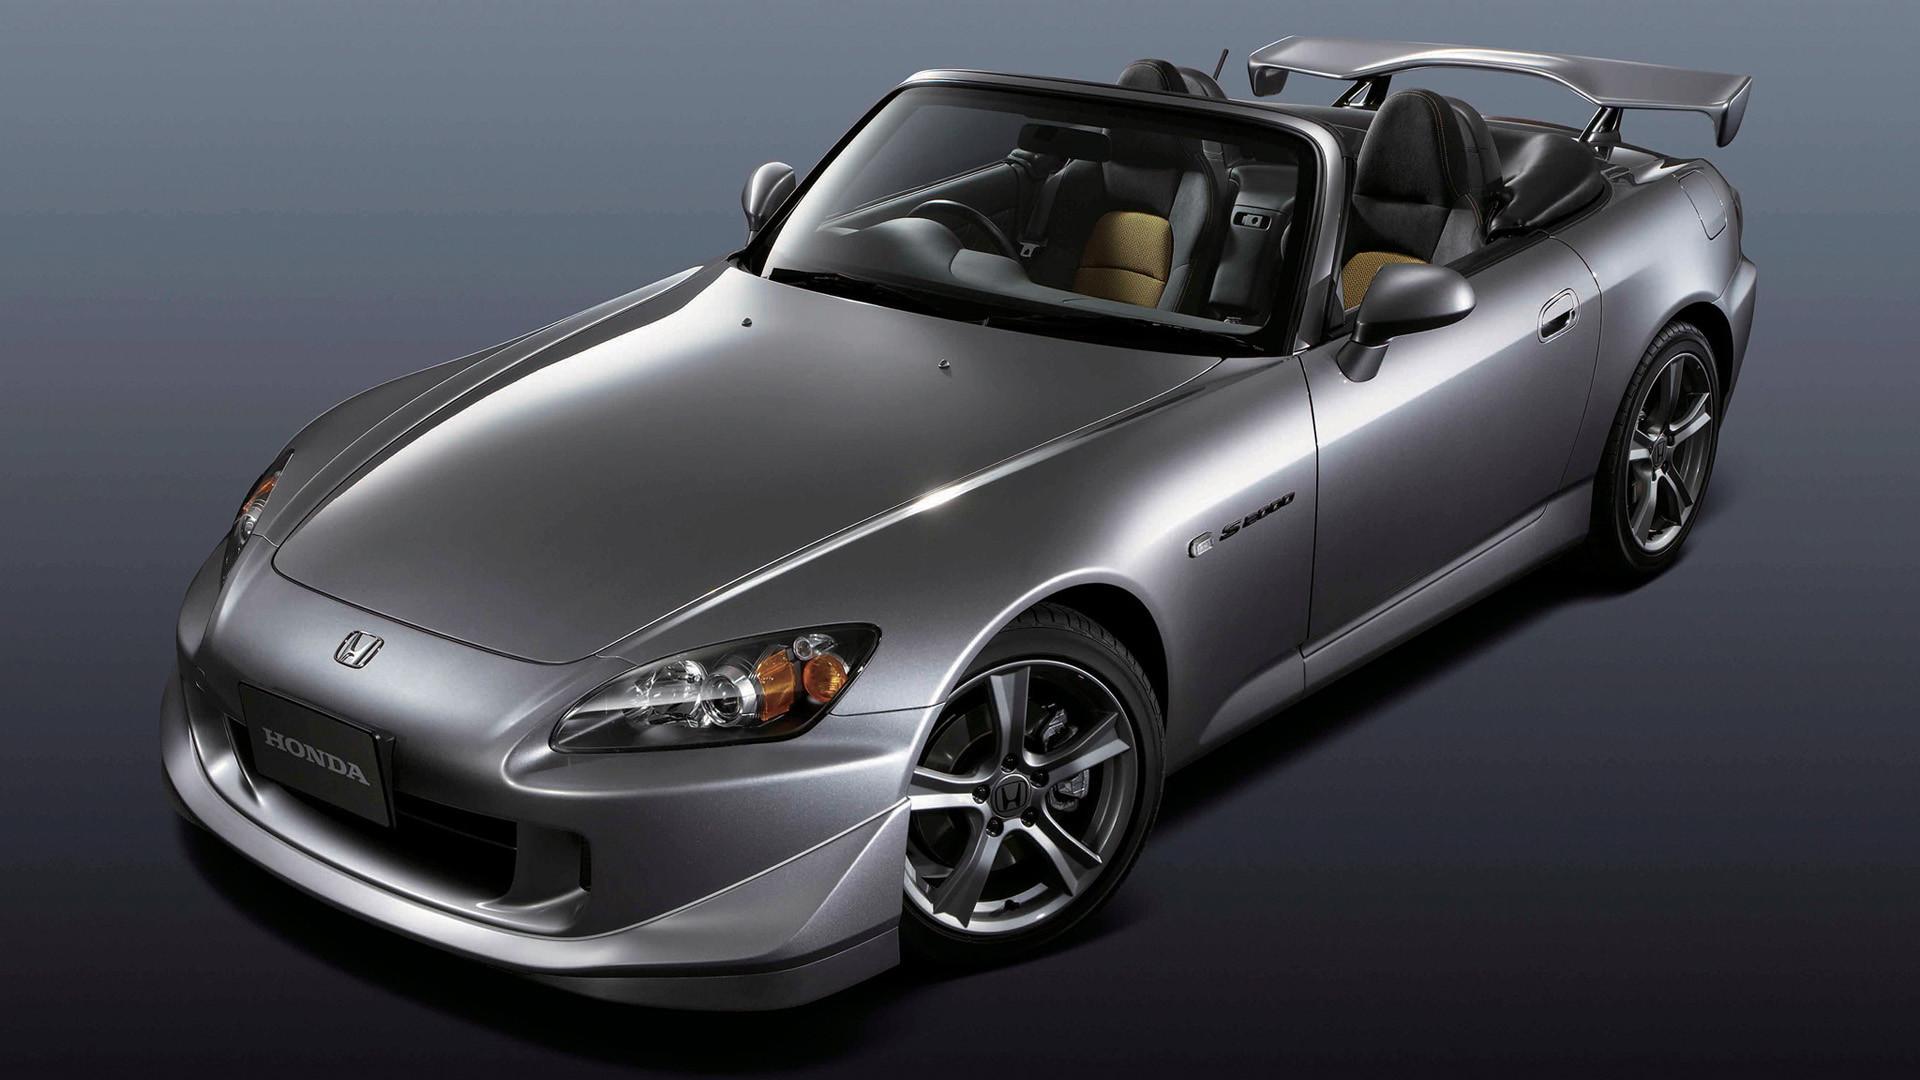 Res: 1920x1080, 2008 Honda S2000 Type-S picture.